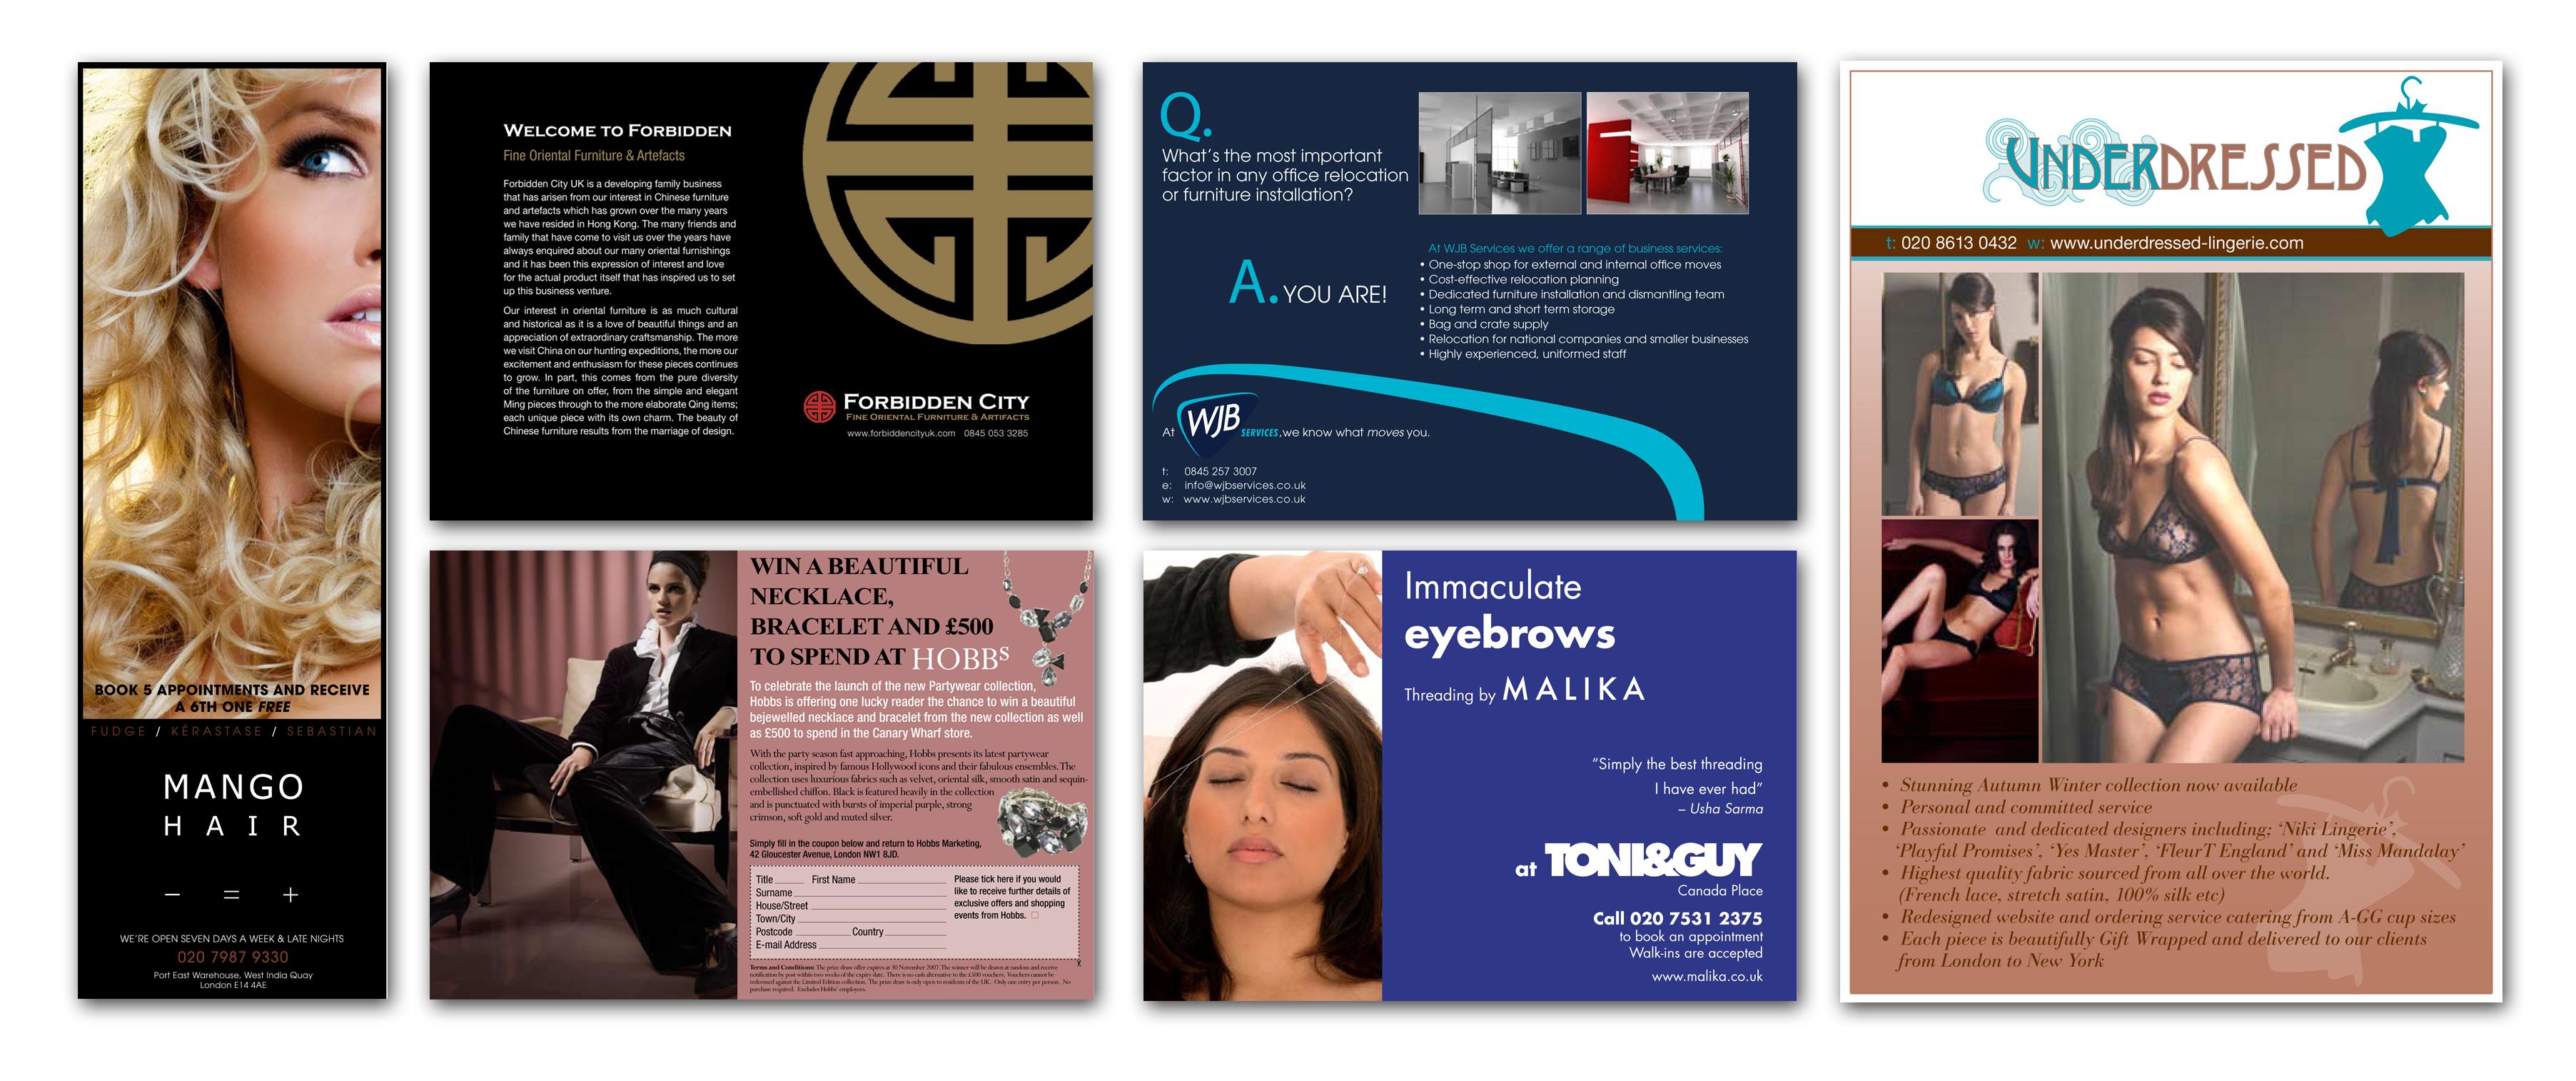 Design of ads RunWildMedia Magazines